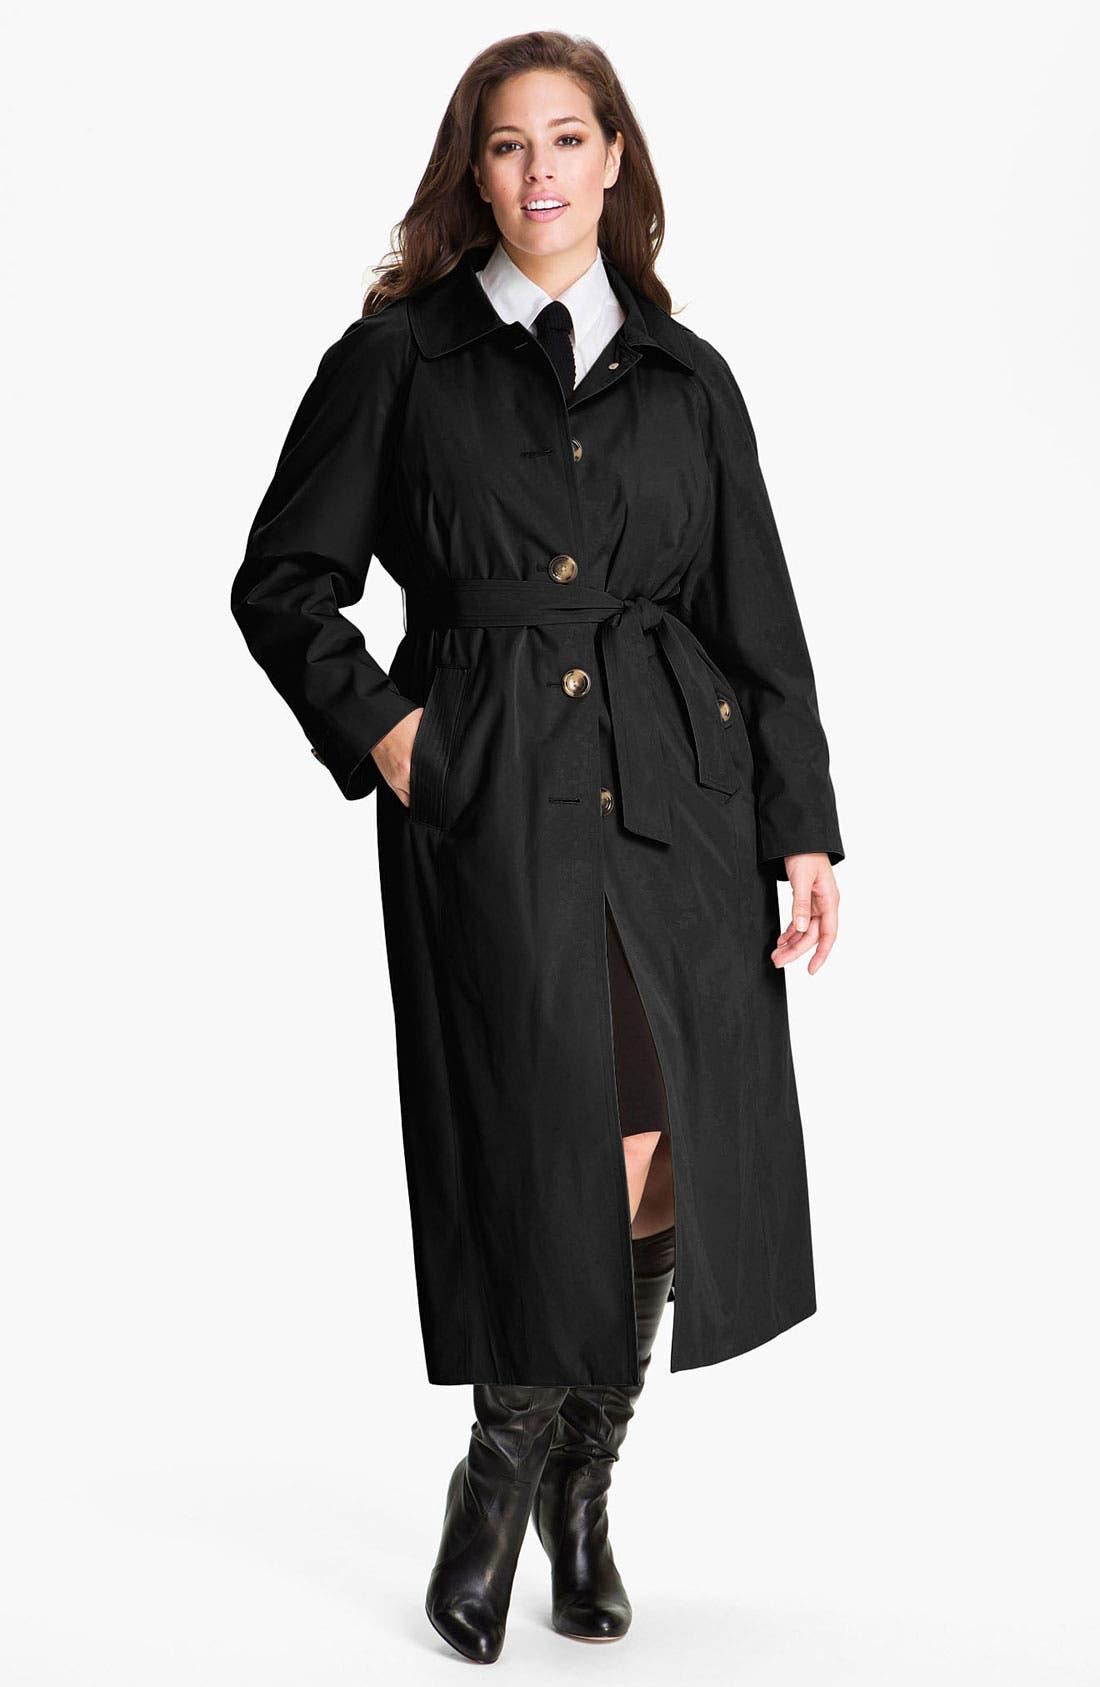 Main Image - London Fog Raglan Sleeve Raincoat with Detachable Liner (Plus) (Online Exclusive)